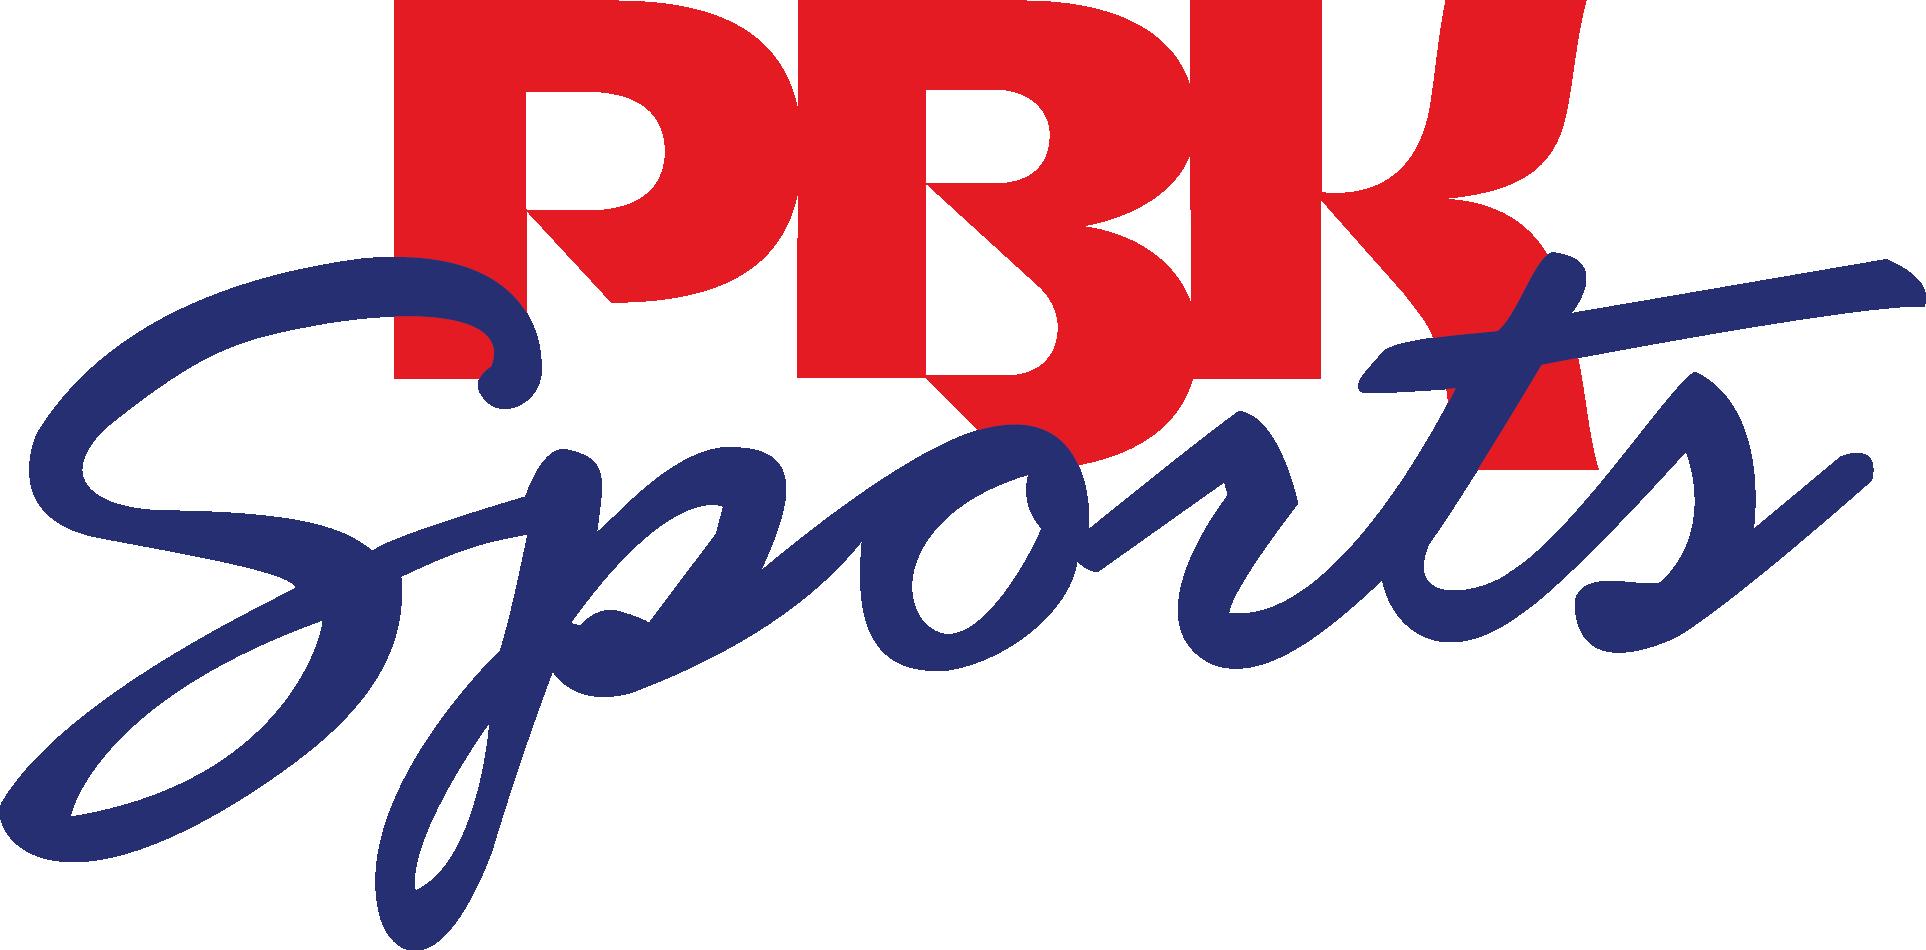 PBK Sports